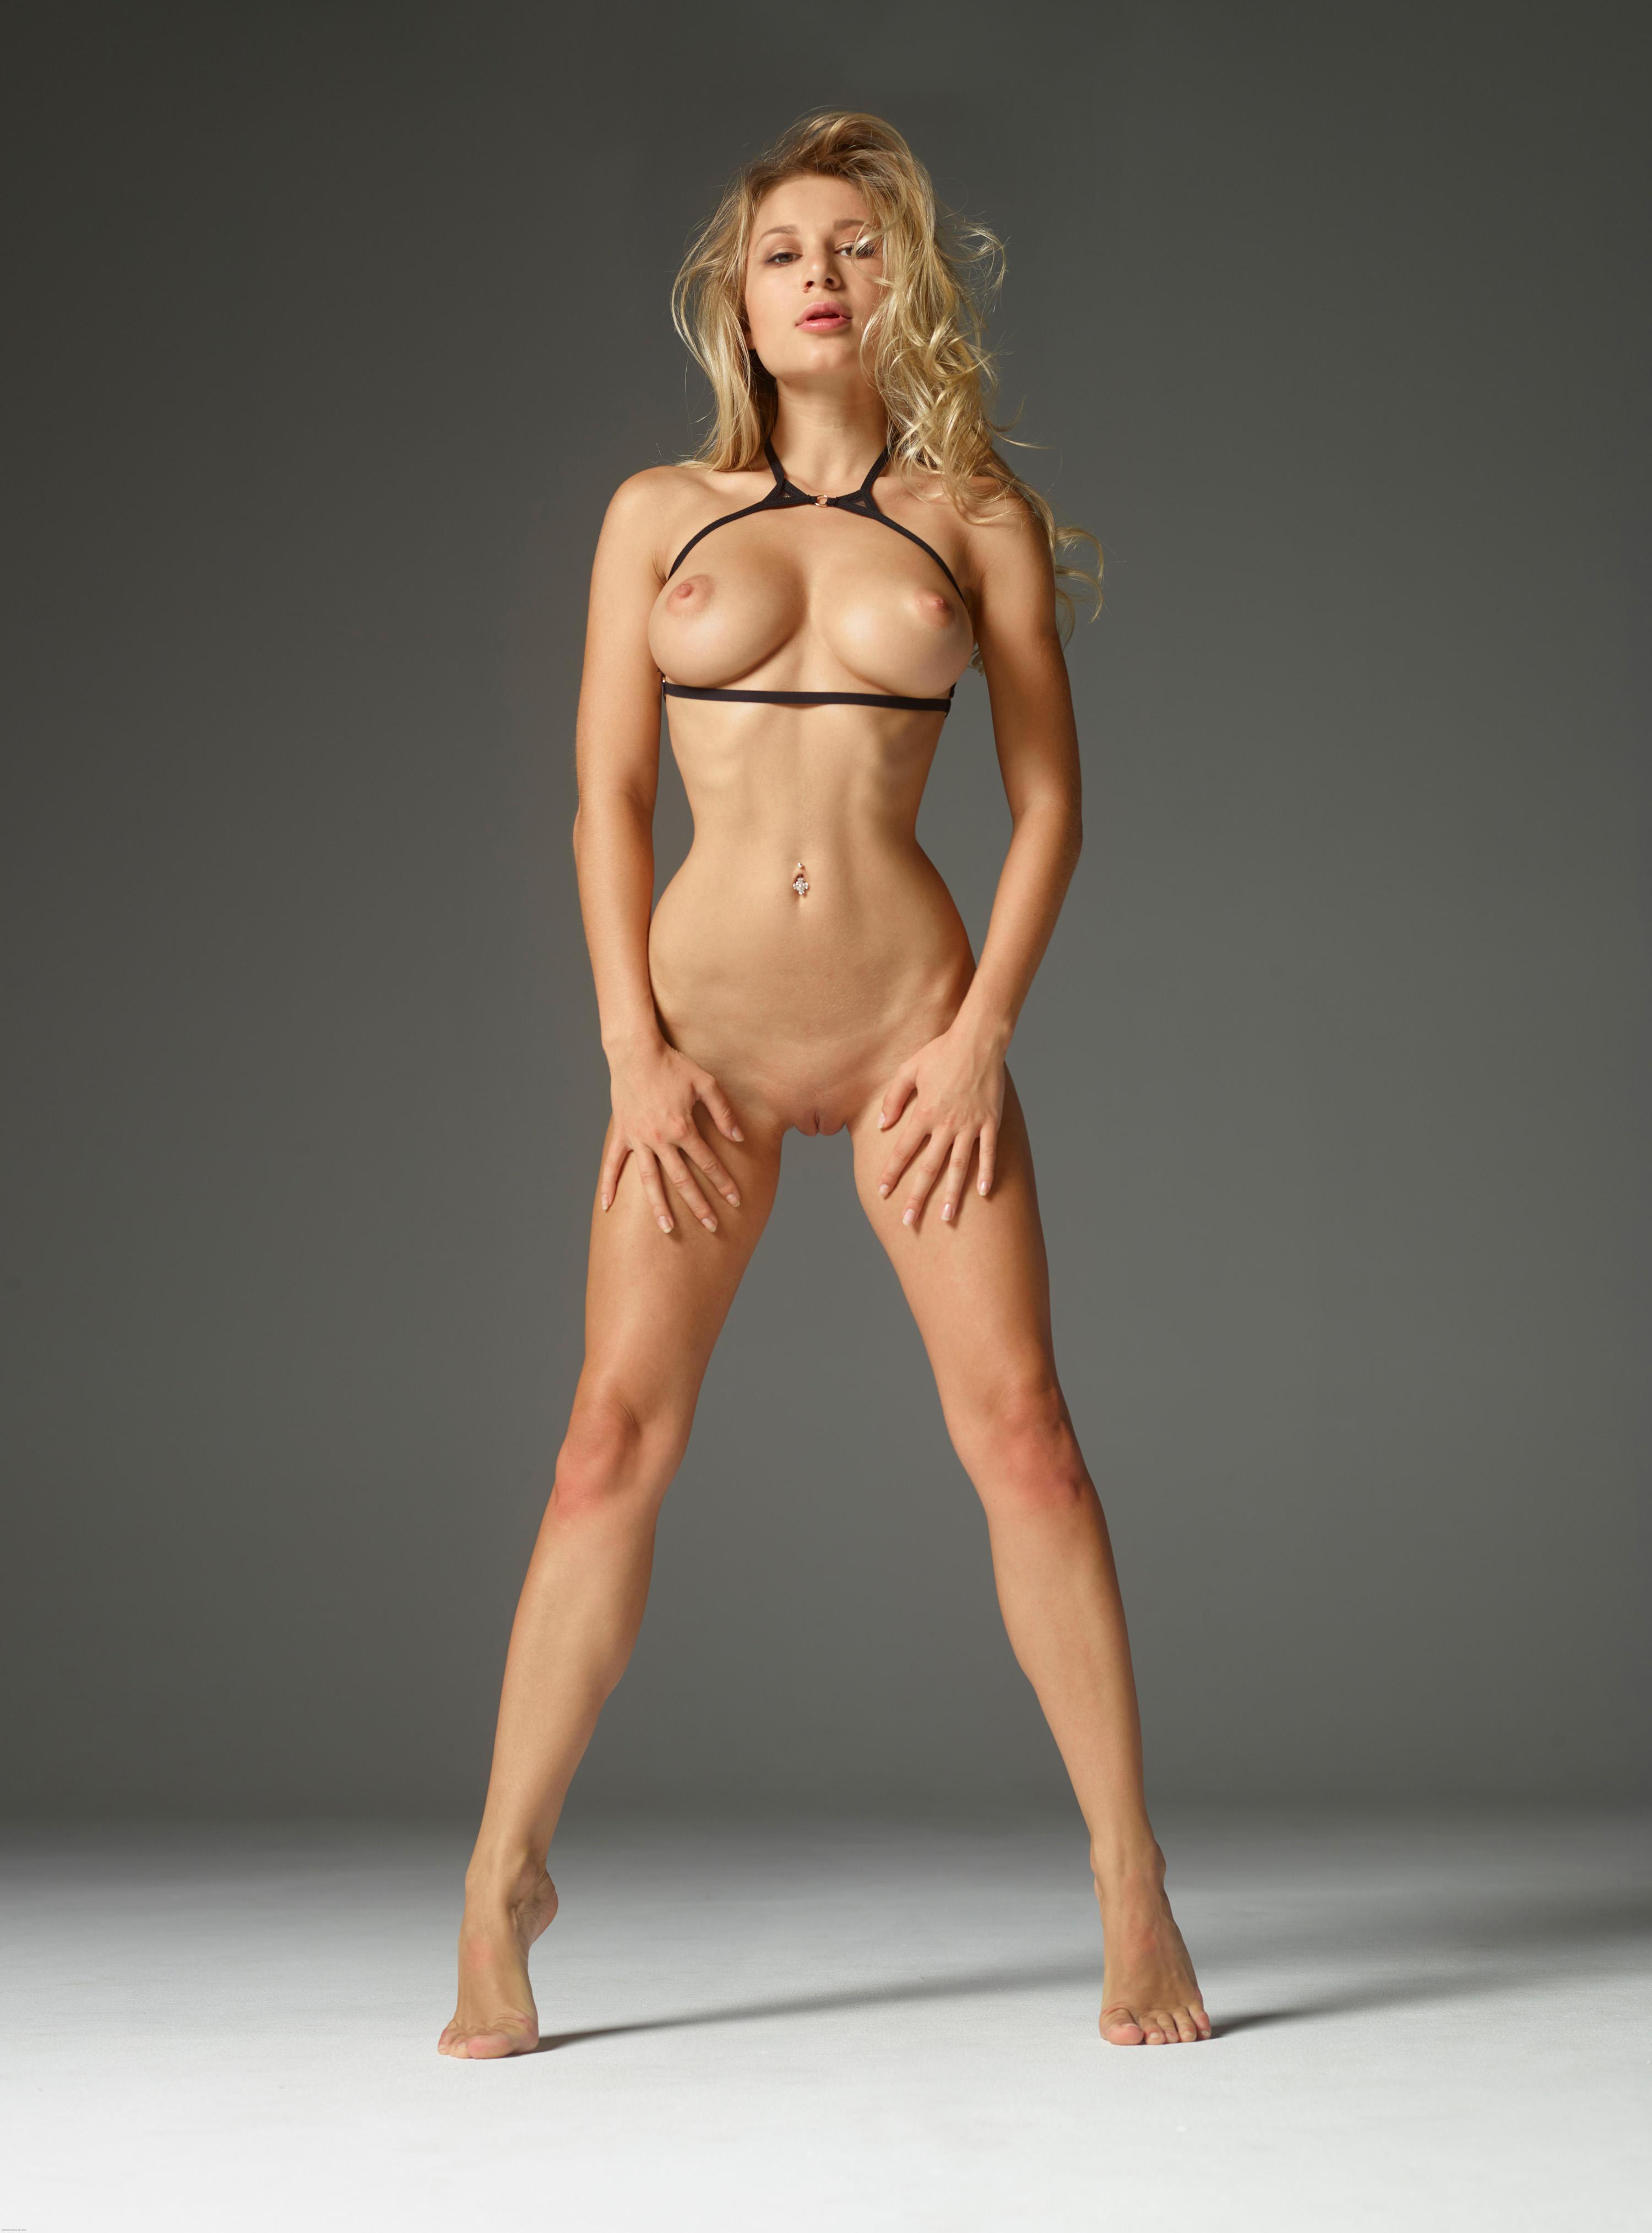 Nude bodies info 6